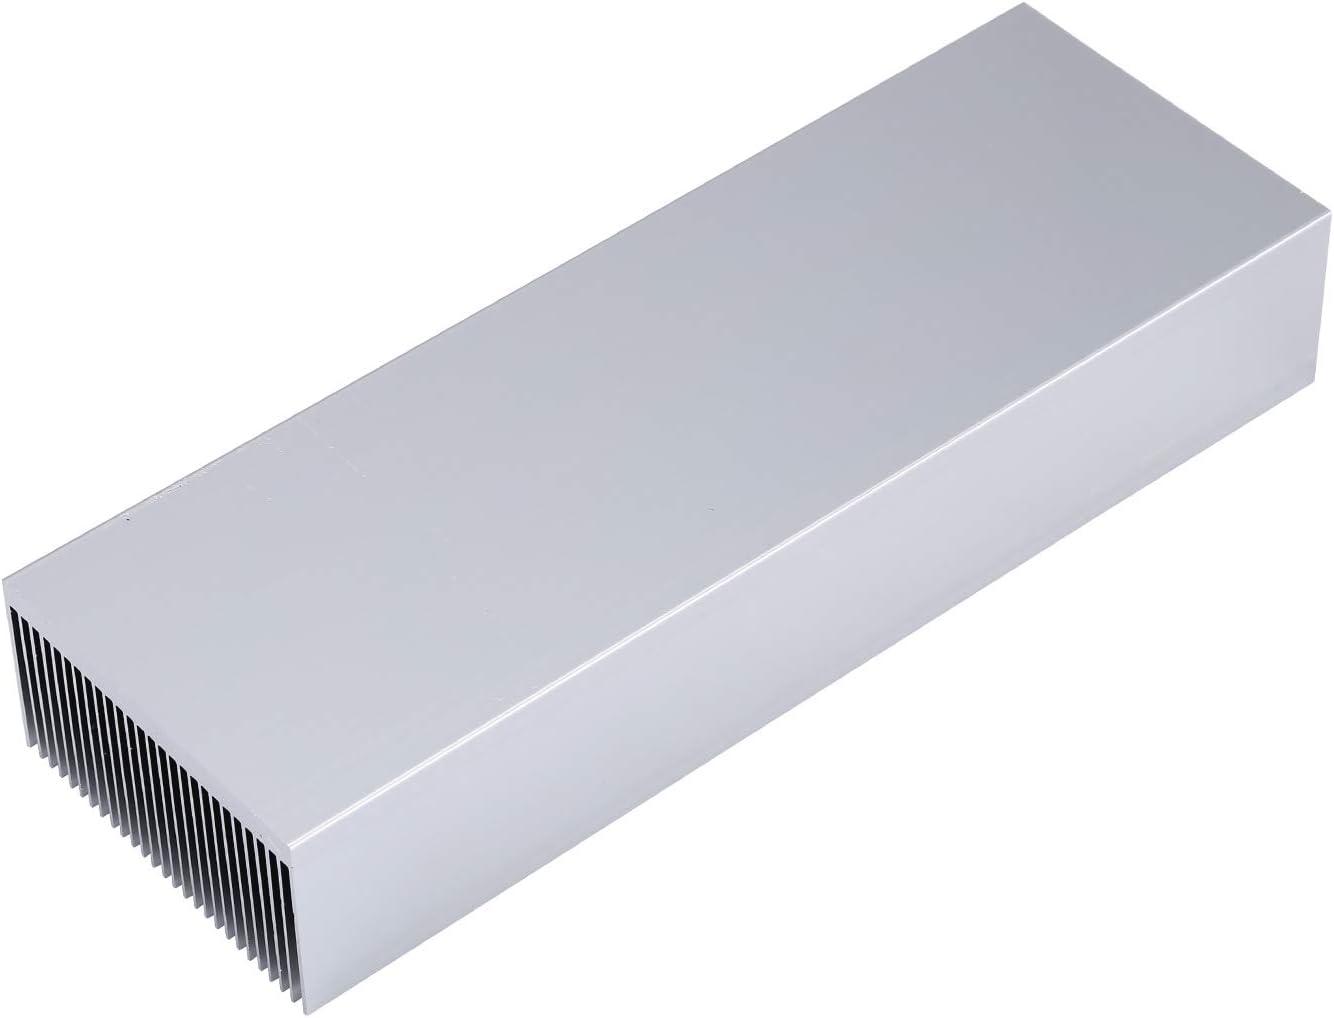 PC Computer PCB Awxlumv Large Aluminum Heatsink 15.75 x2.71 x 1.41 // 400 x 69 x 36mm Heat Sinks Cooling 27 Fin Radiator for IC Module Led